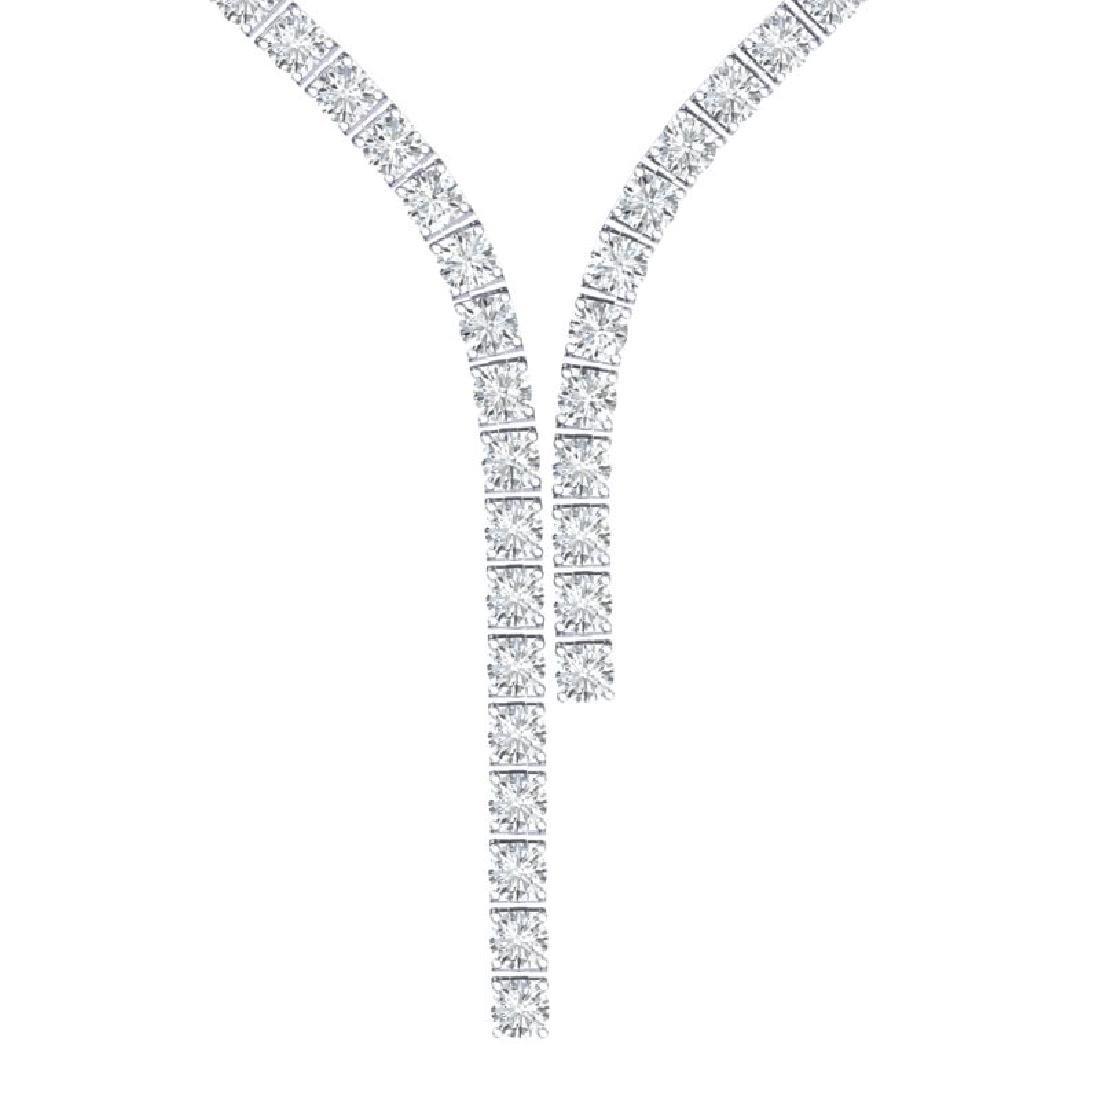 25 CTW Certified VS/SI Diamond Necklace 18K White Gold